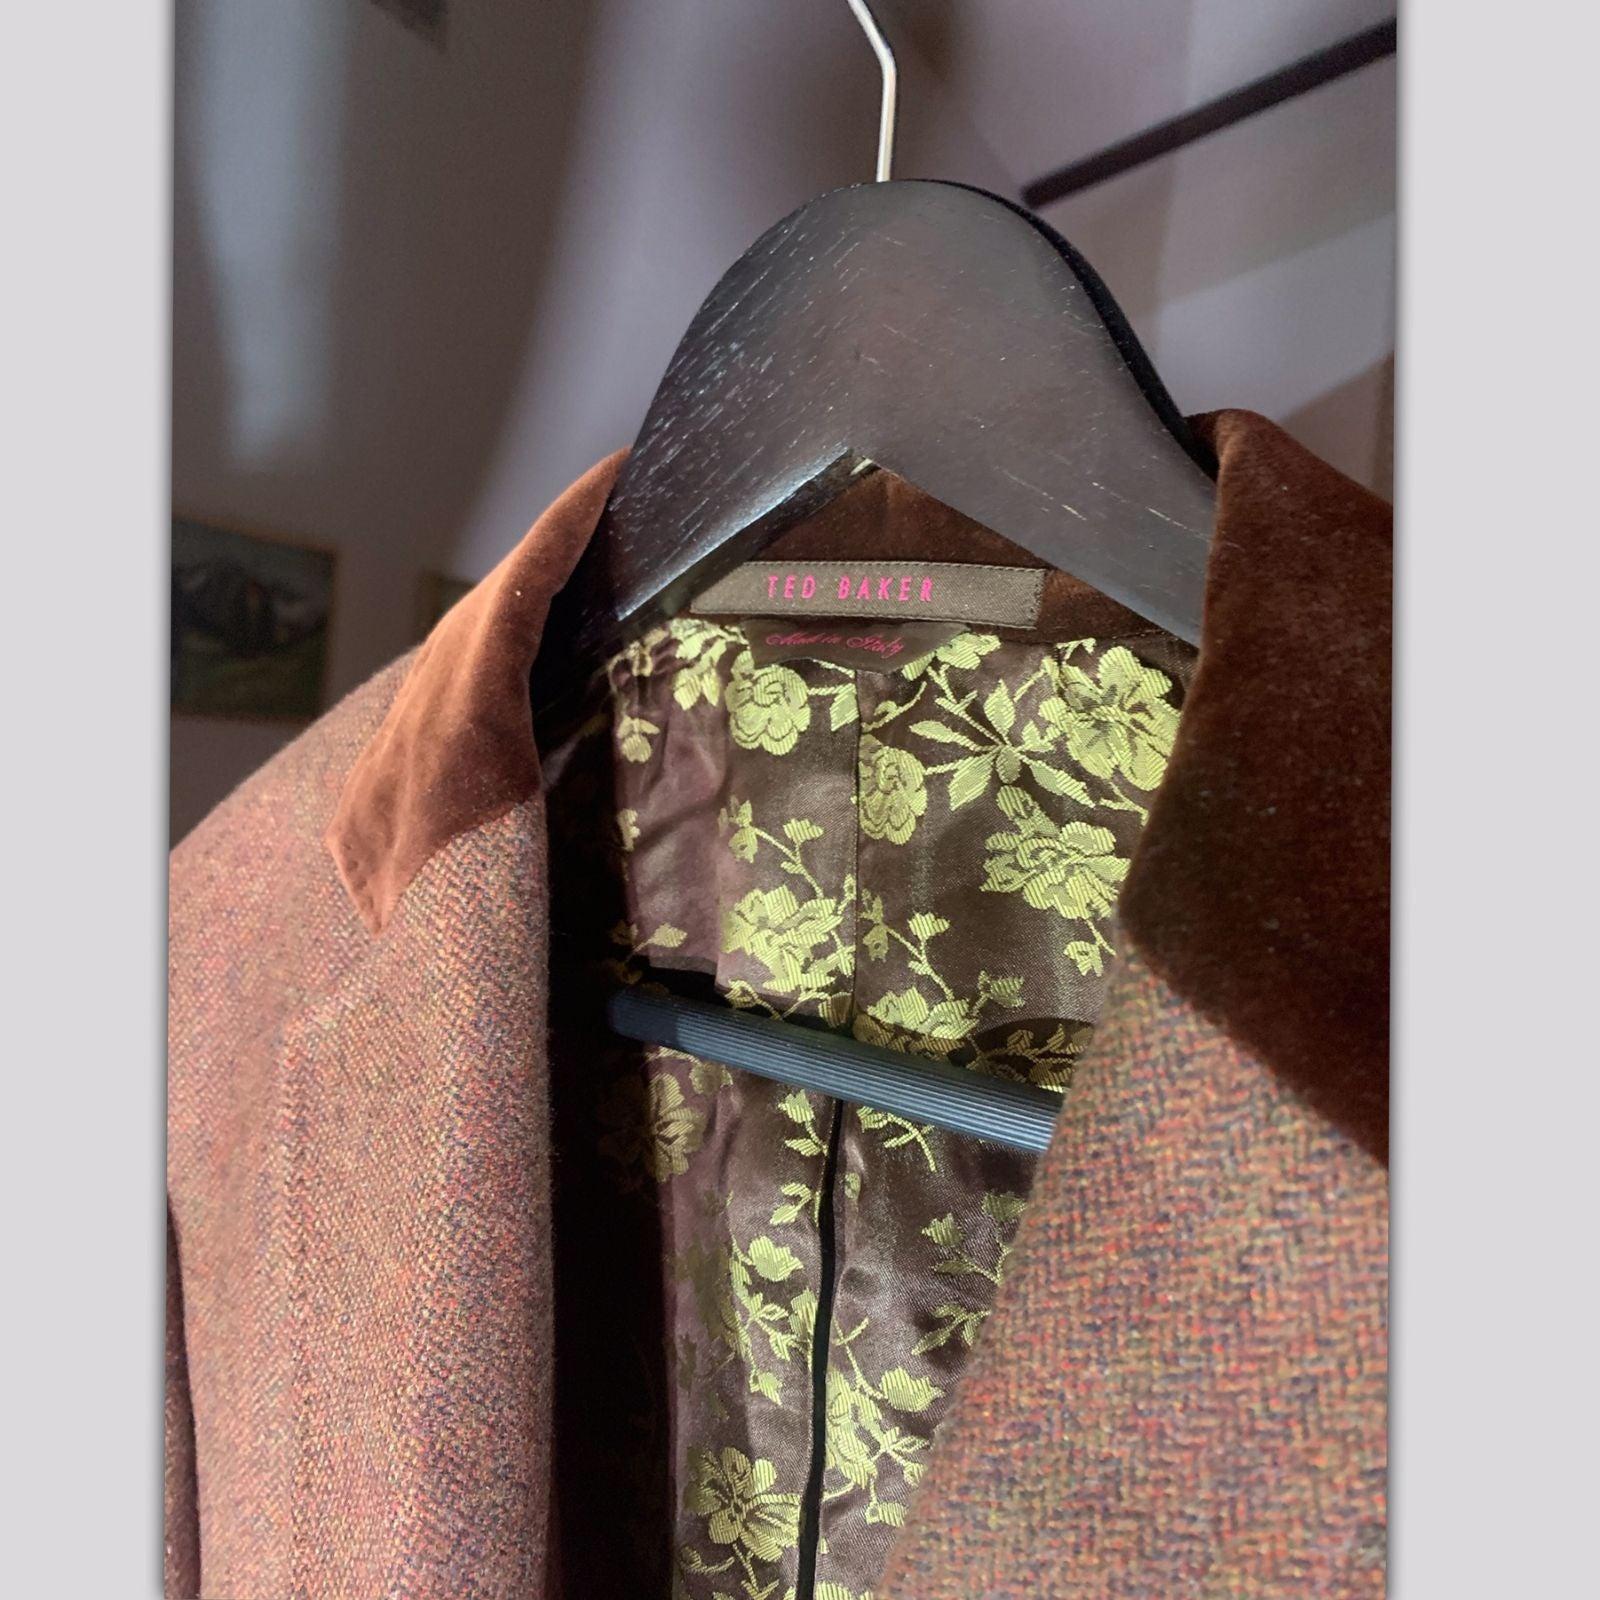 Ted Baker Men's Soften Cashmere Jacket S